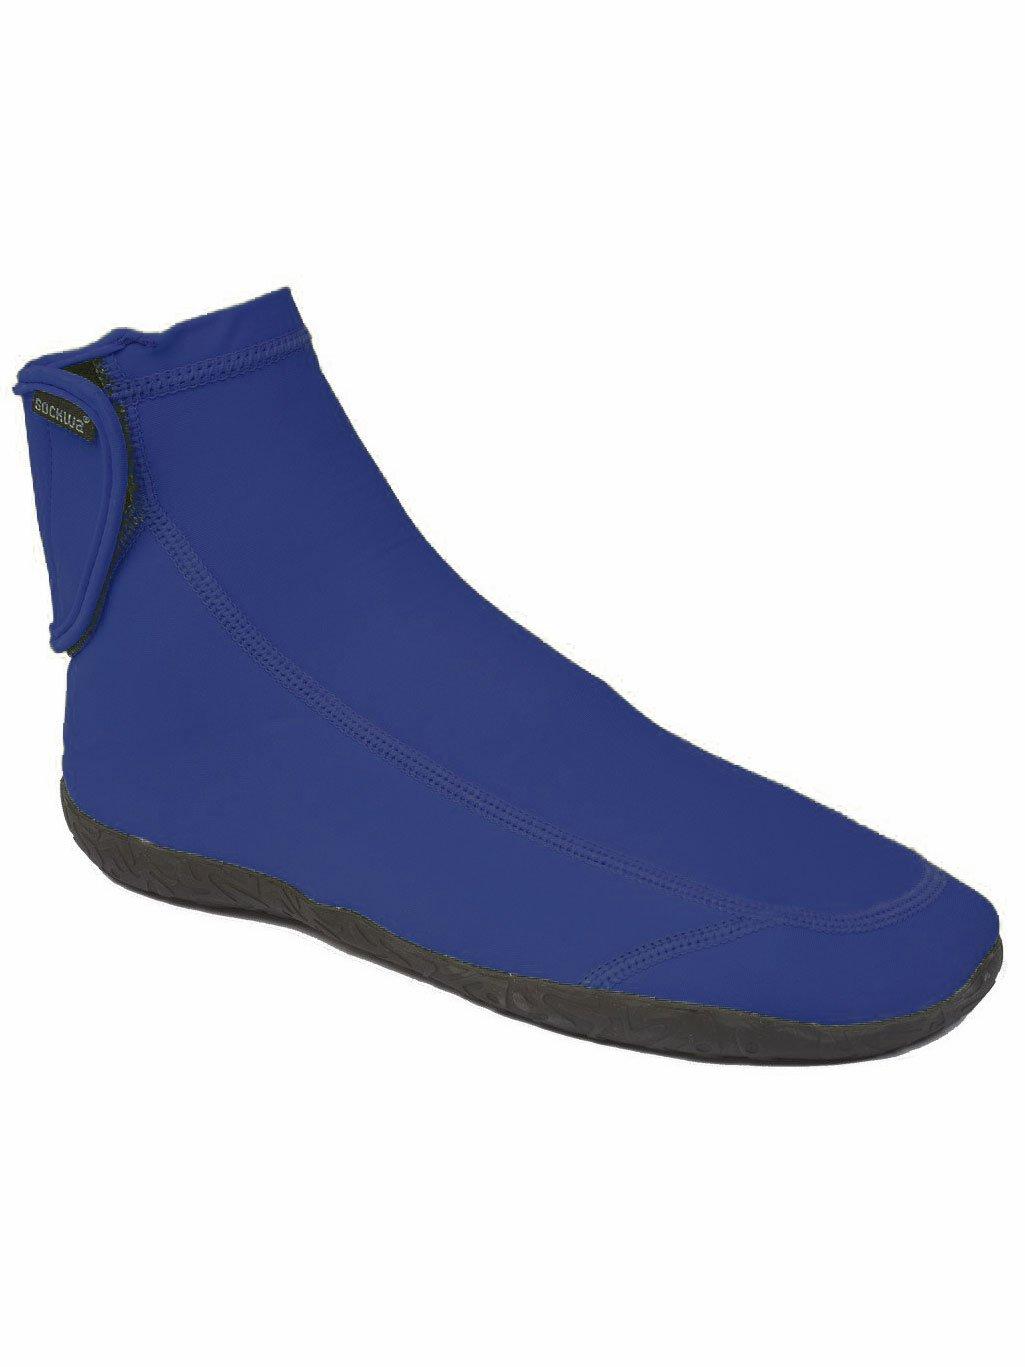 Sockwa G-HI Minimal Beach Sneaker B01N7WR997 W6/M5|Navy